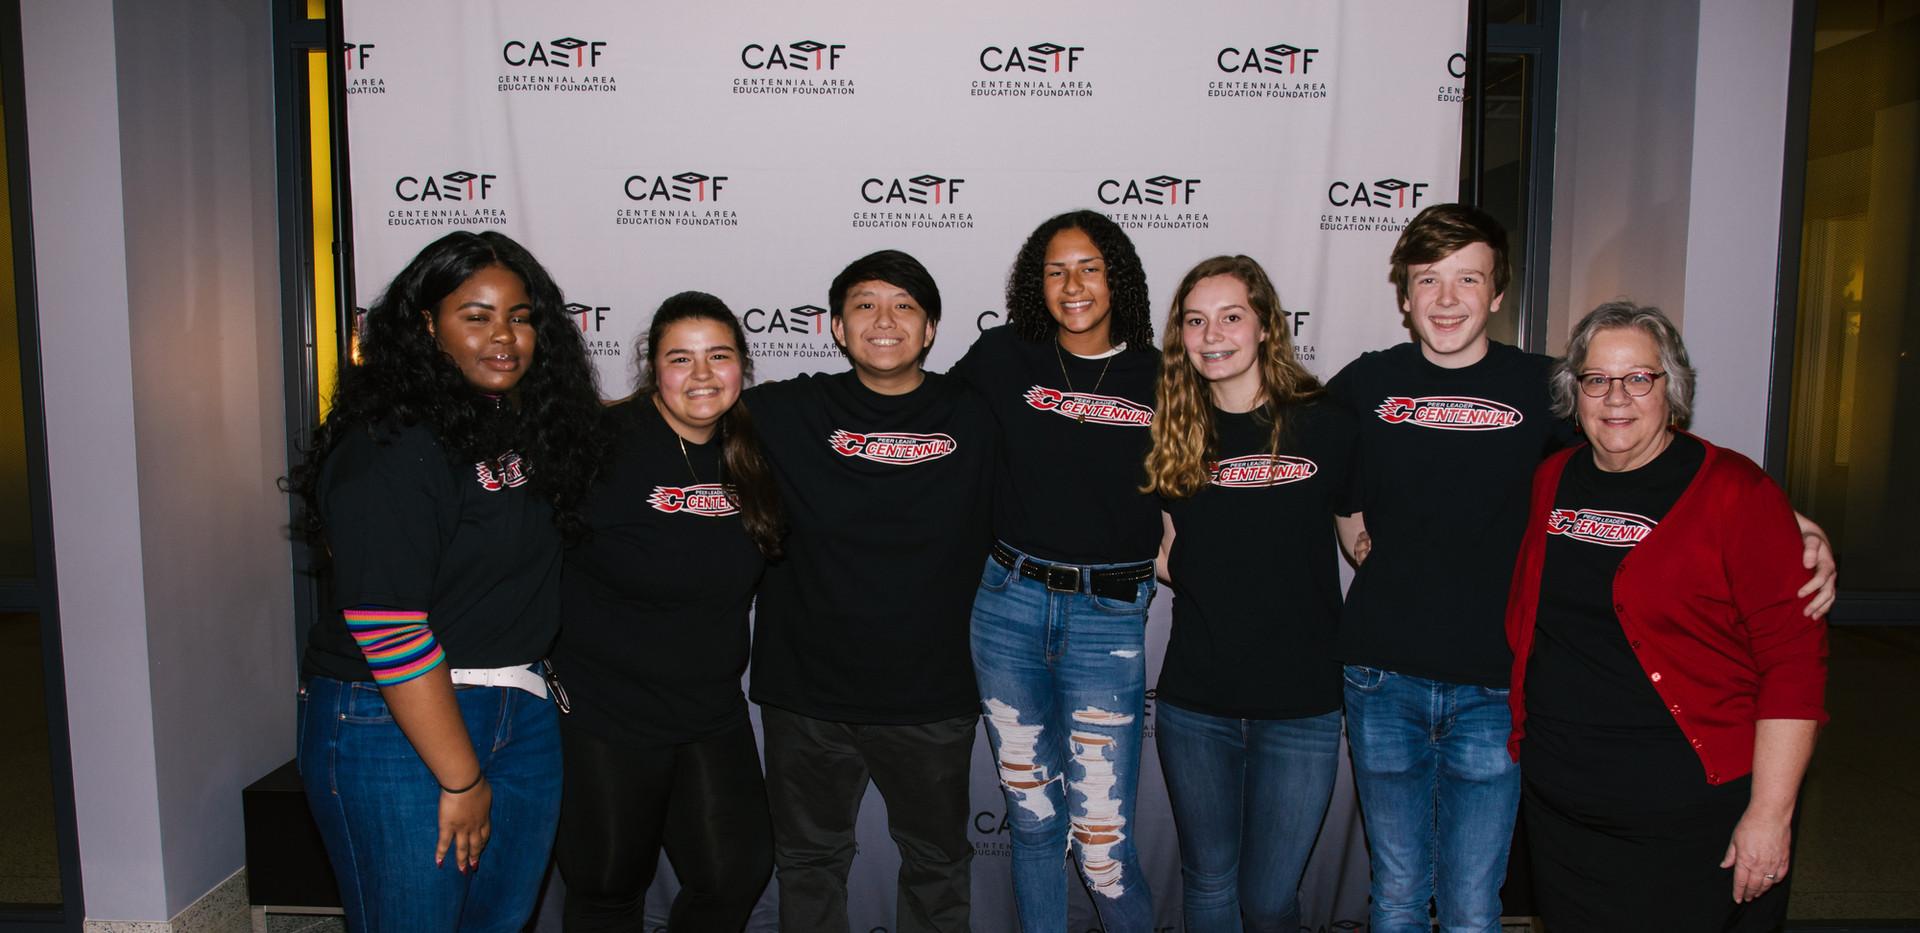 CAEF Gala Students.jpg